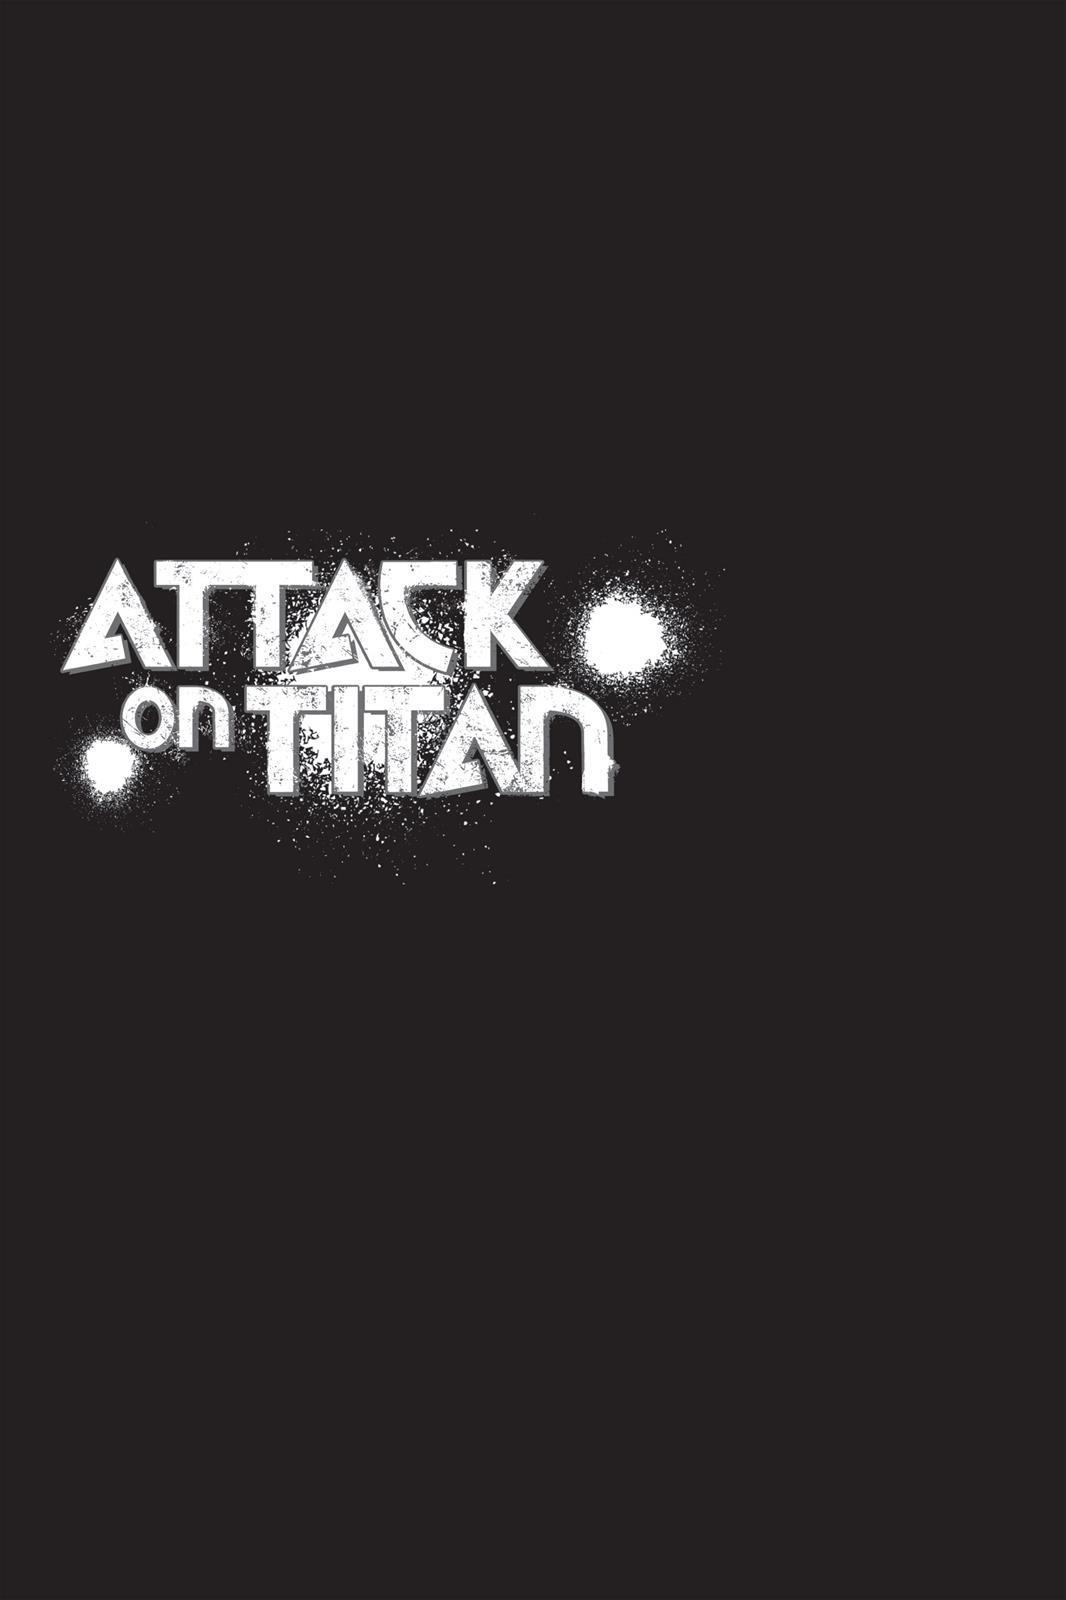 Attack On Titan, Episode 12 image 044